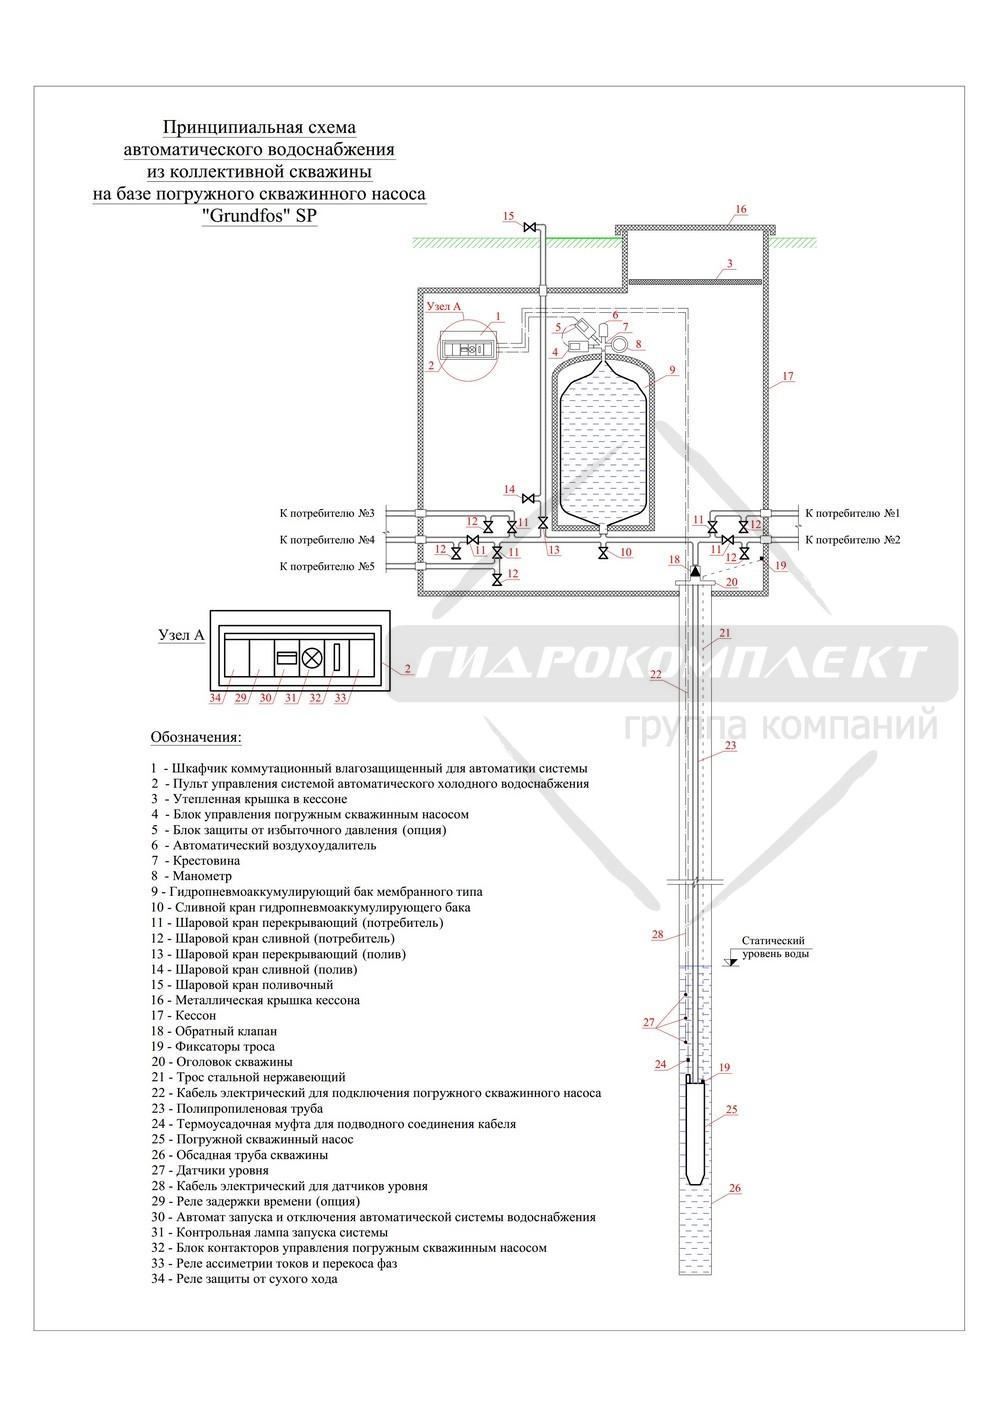 схема системы автоматика на скважину